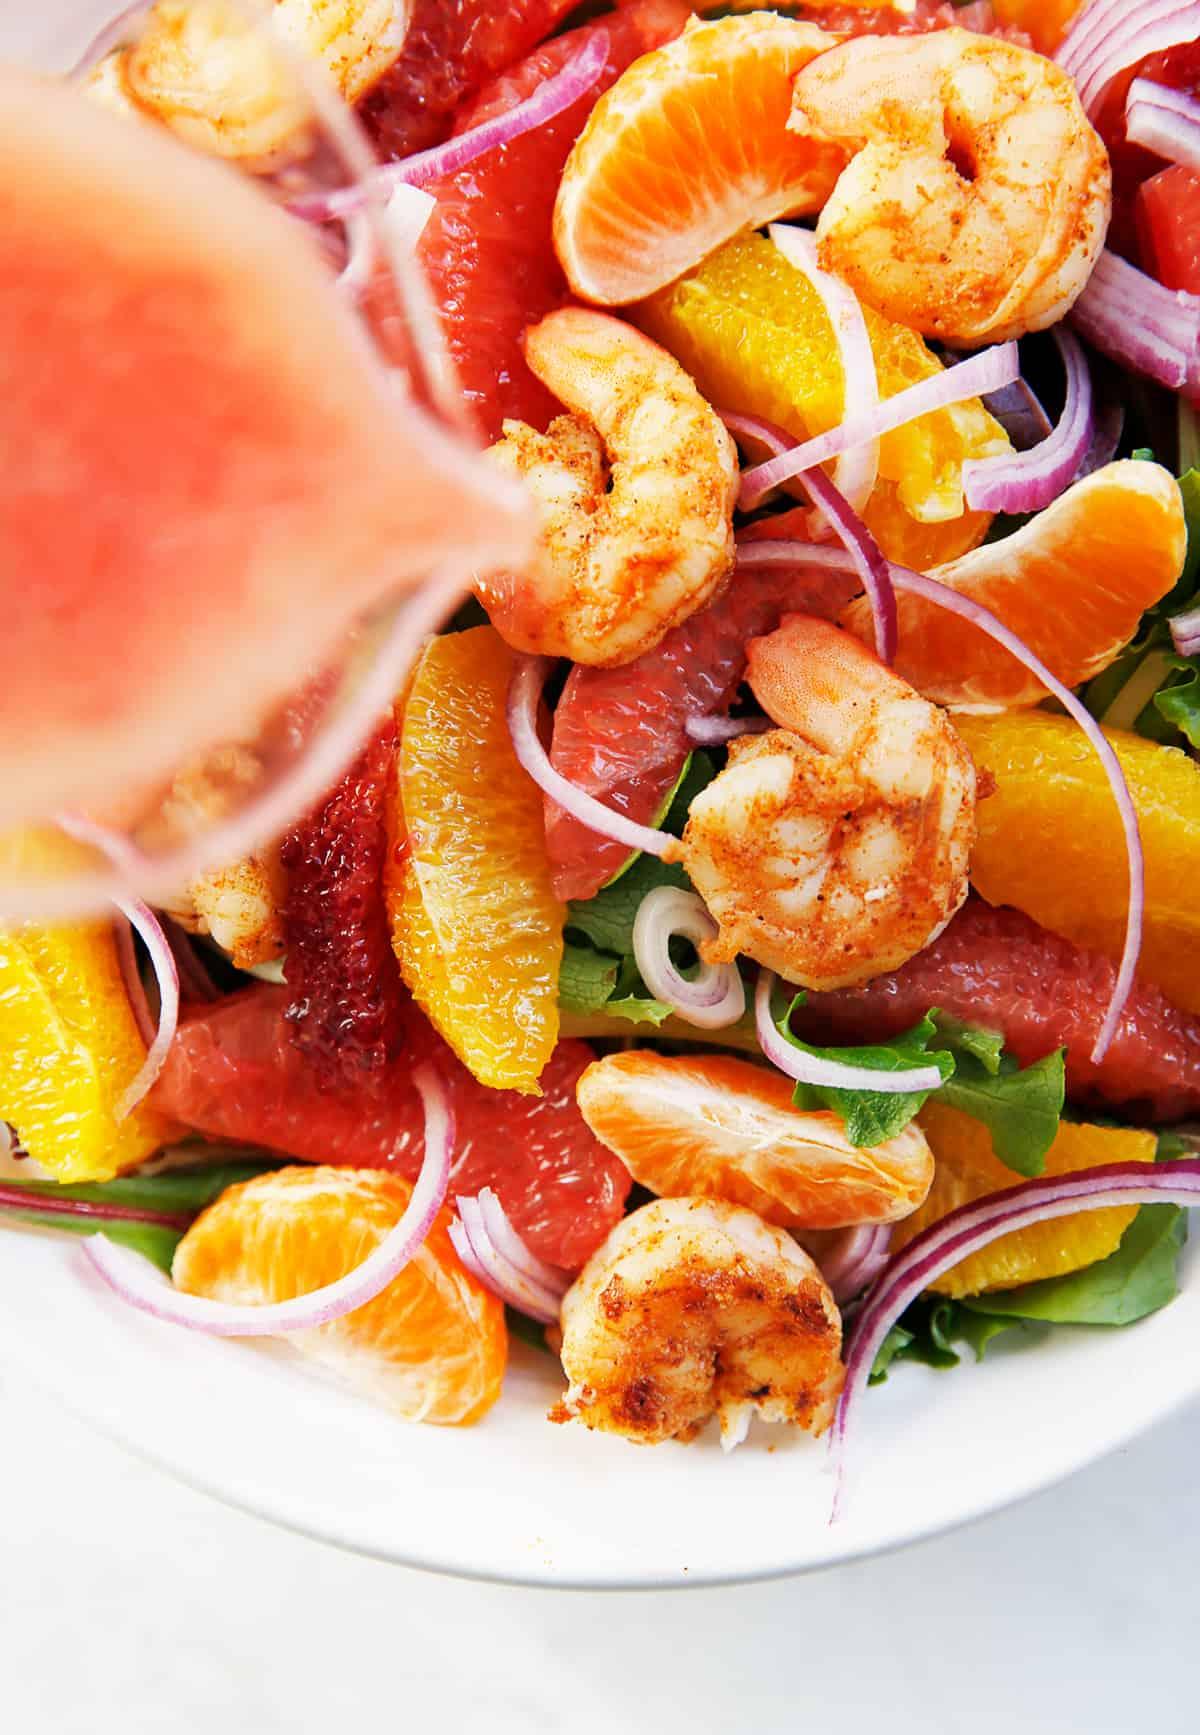 Grapefruit vinaigrette being poured over citrus shrimp salad.